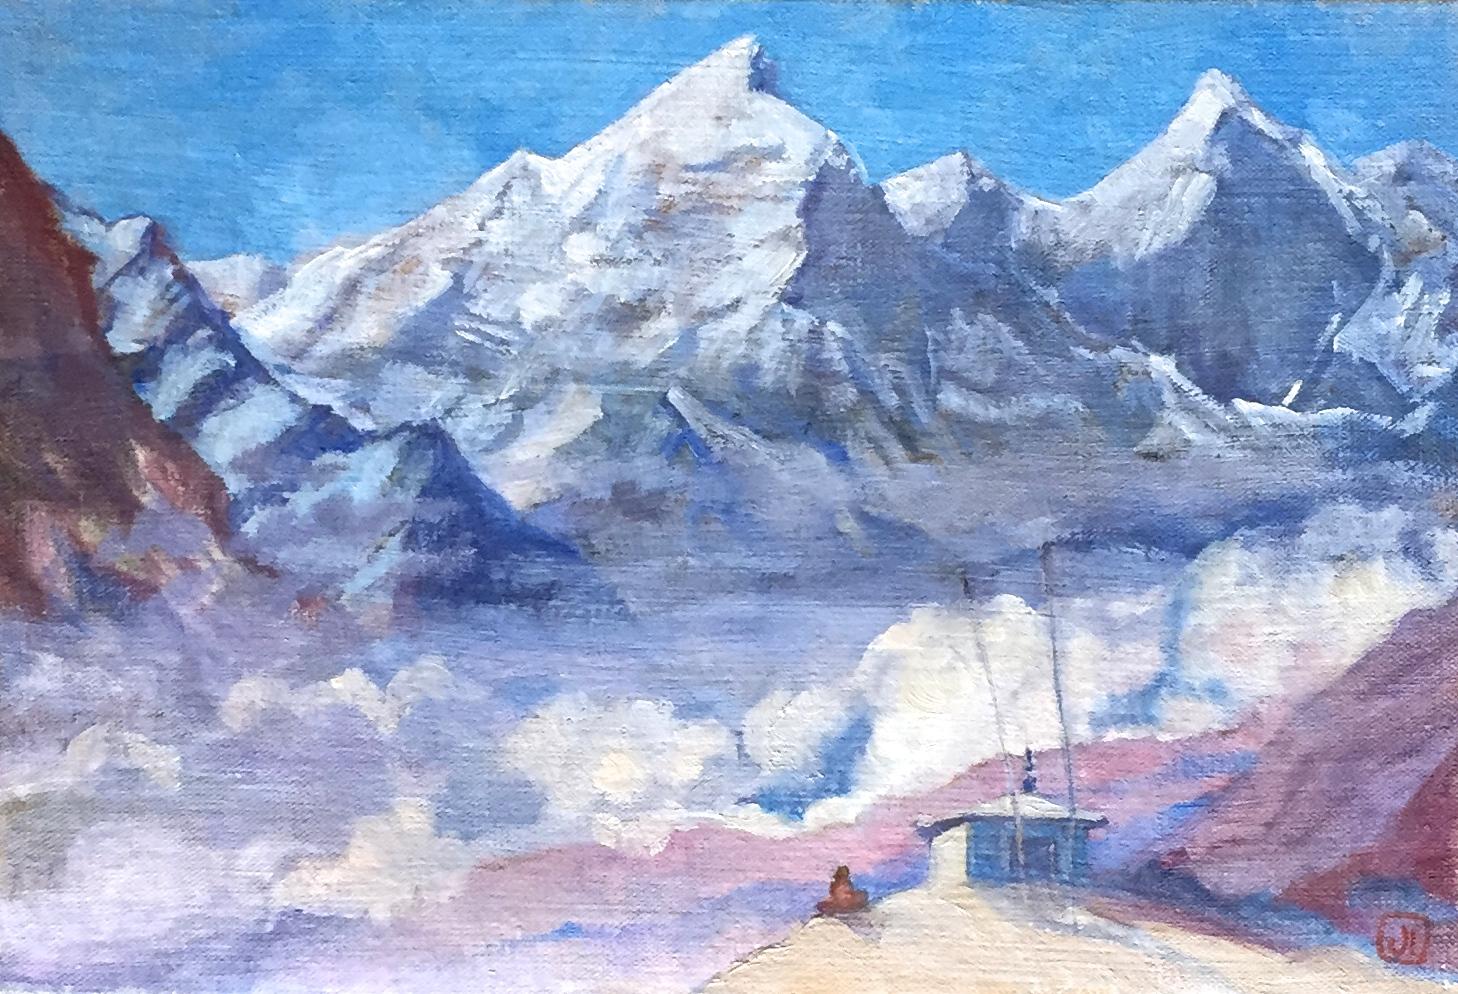 Heart of Peace, Himalaya